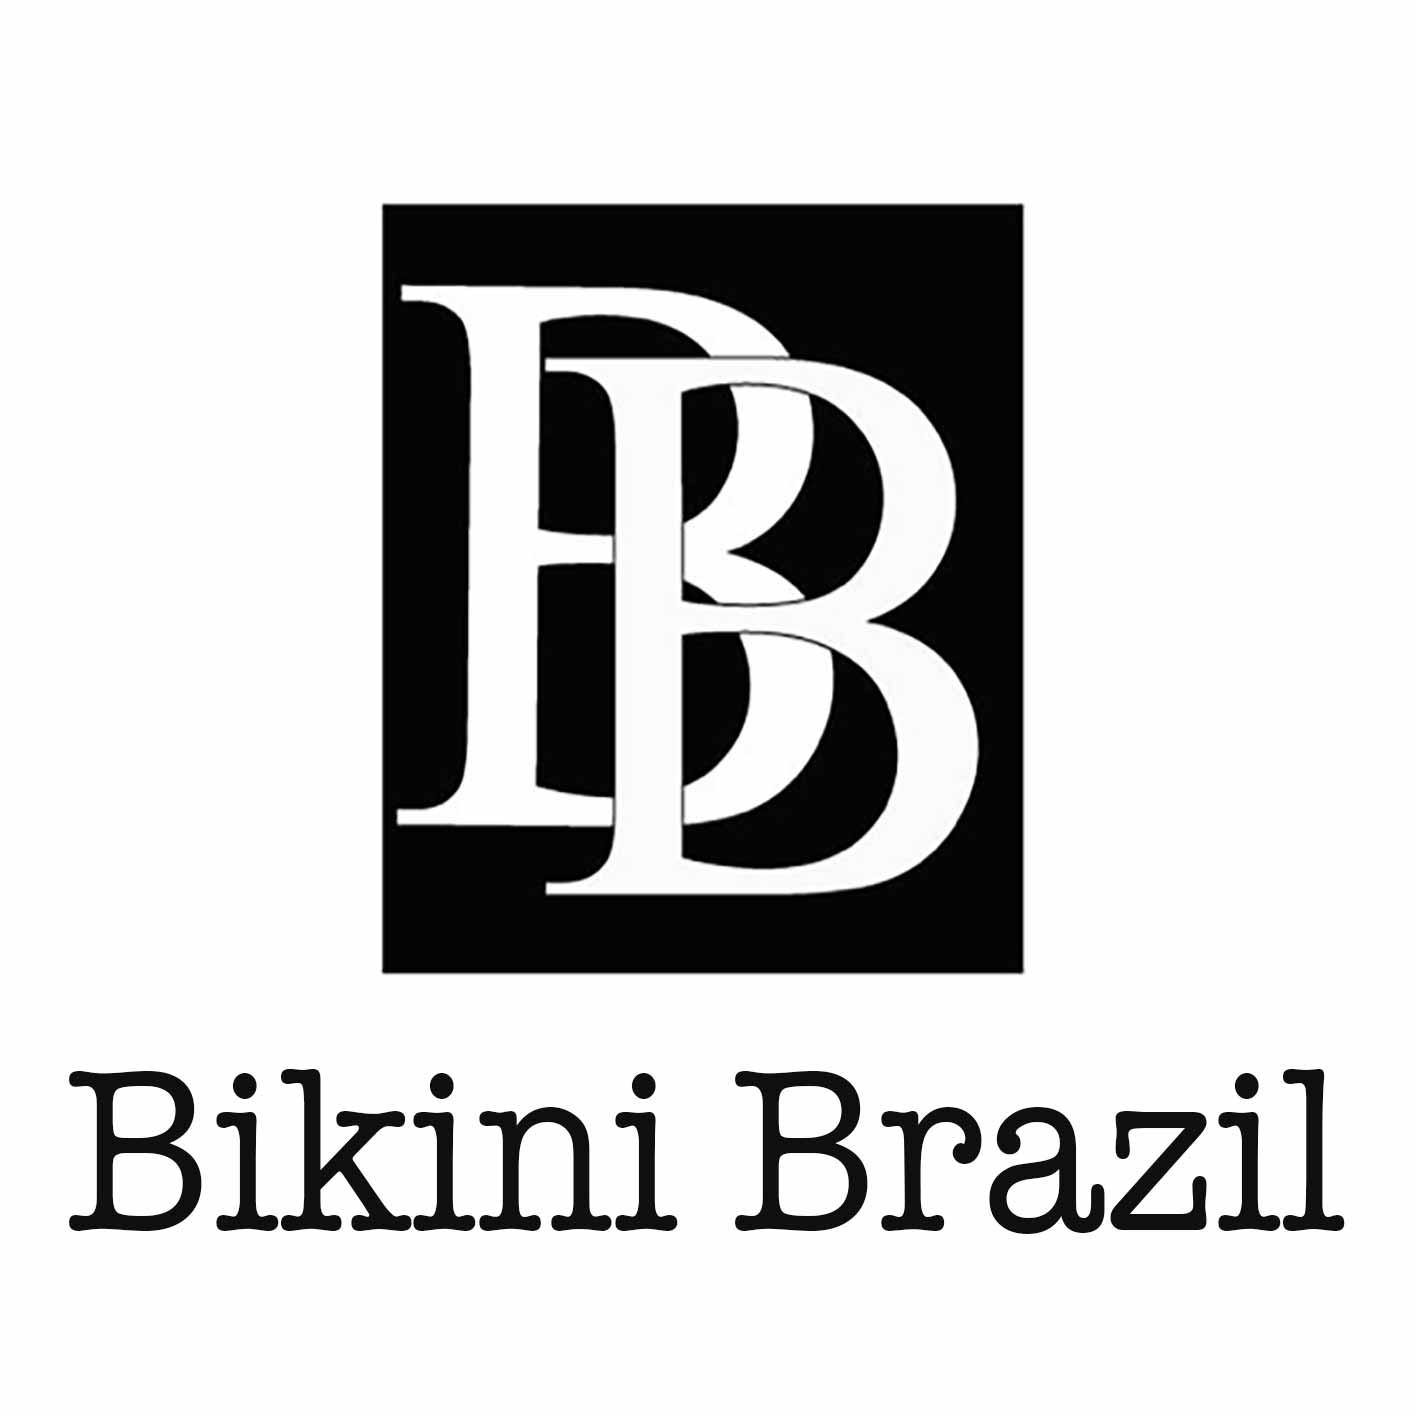 Boutique bikini brazil